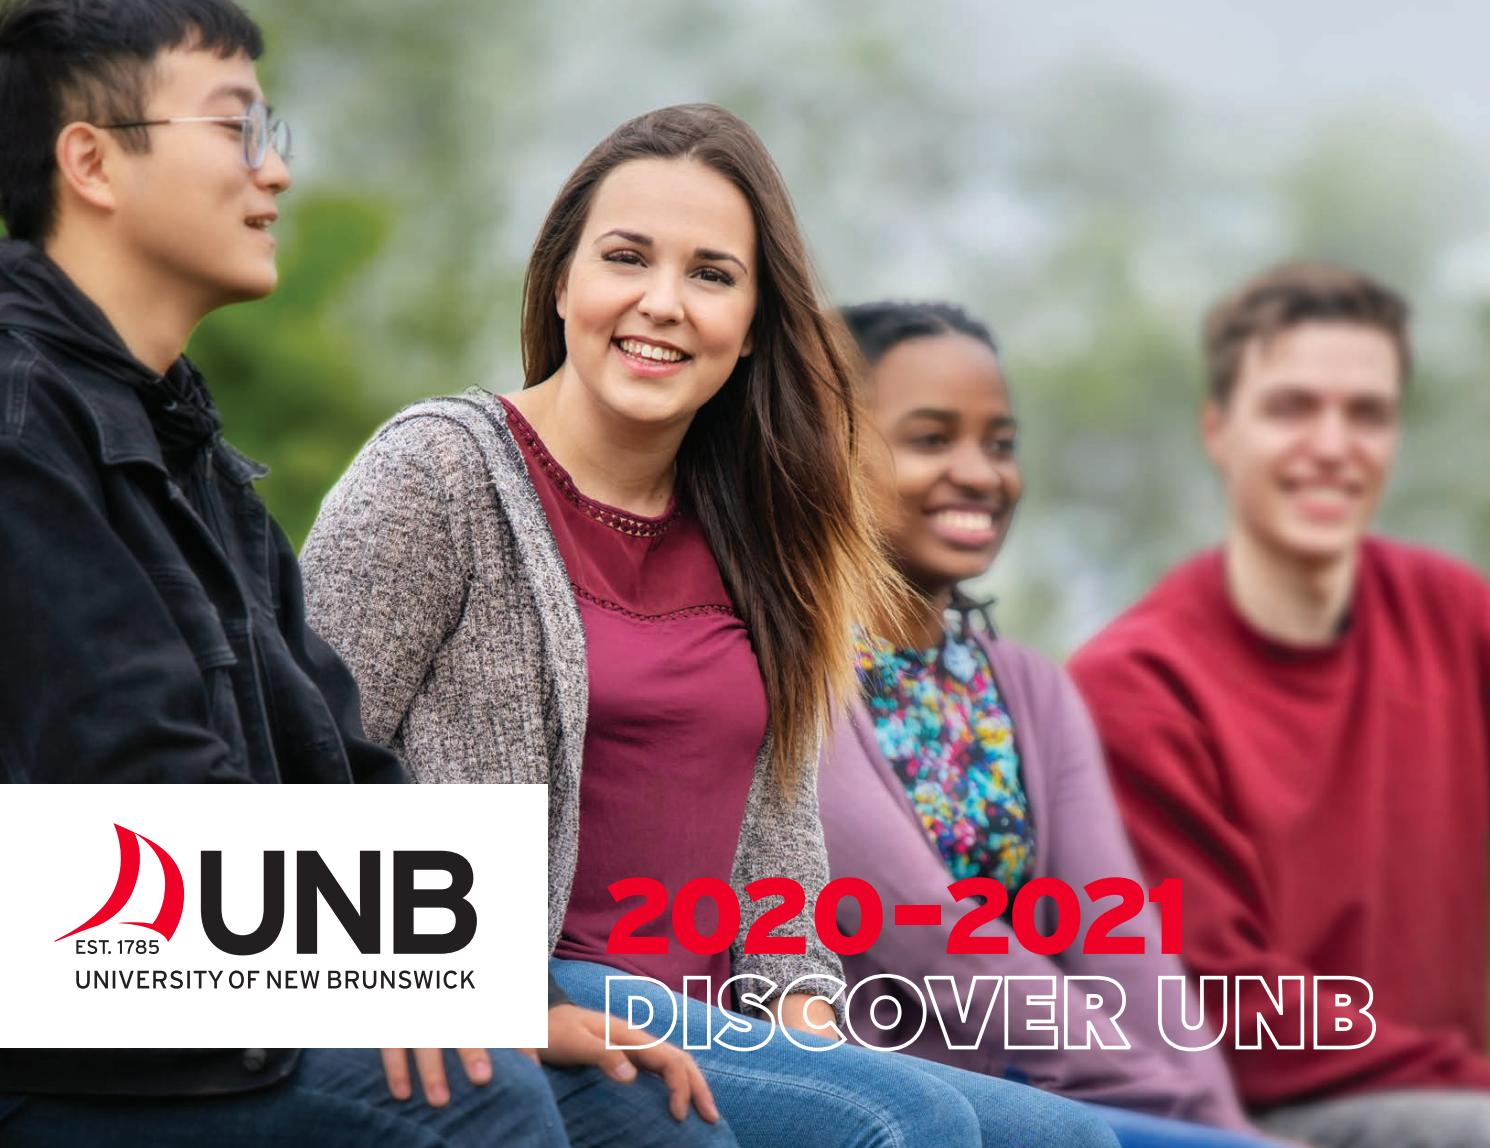 University Of New Brunswick Viewbook 2020 2021University Regarding St Vrain Extended School Year Calendar 2021 2021